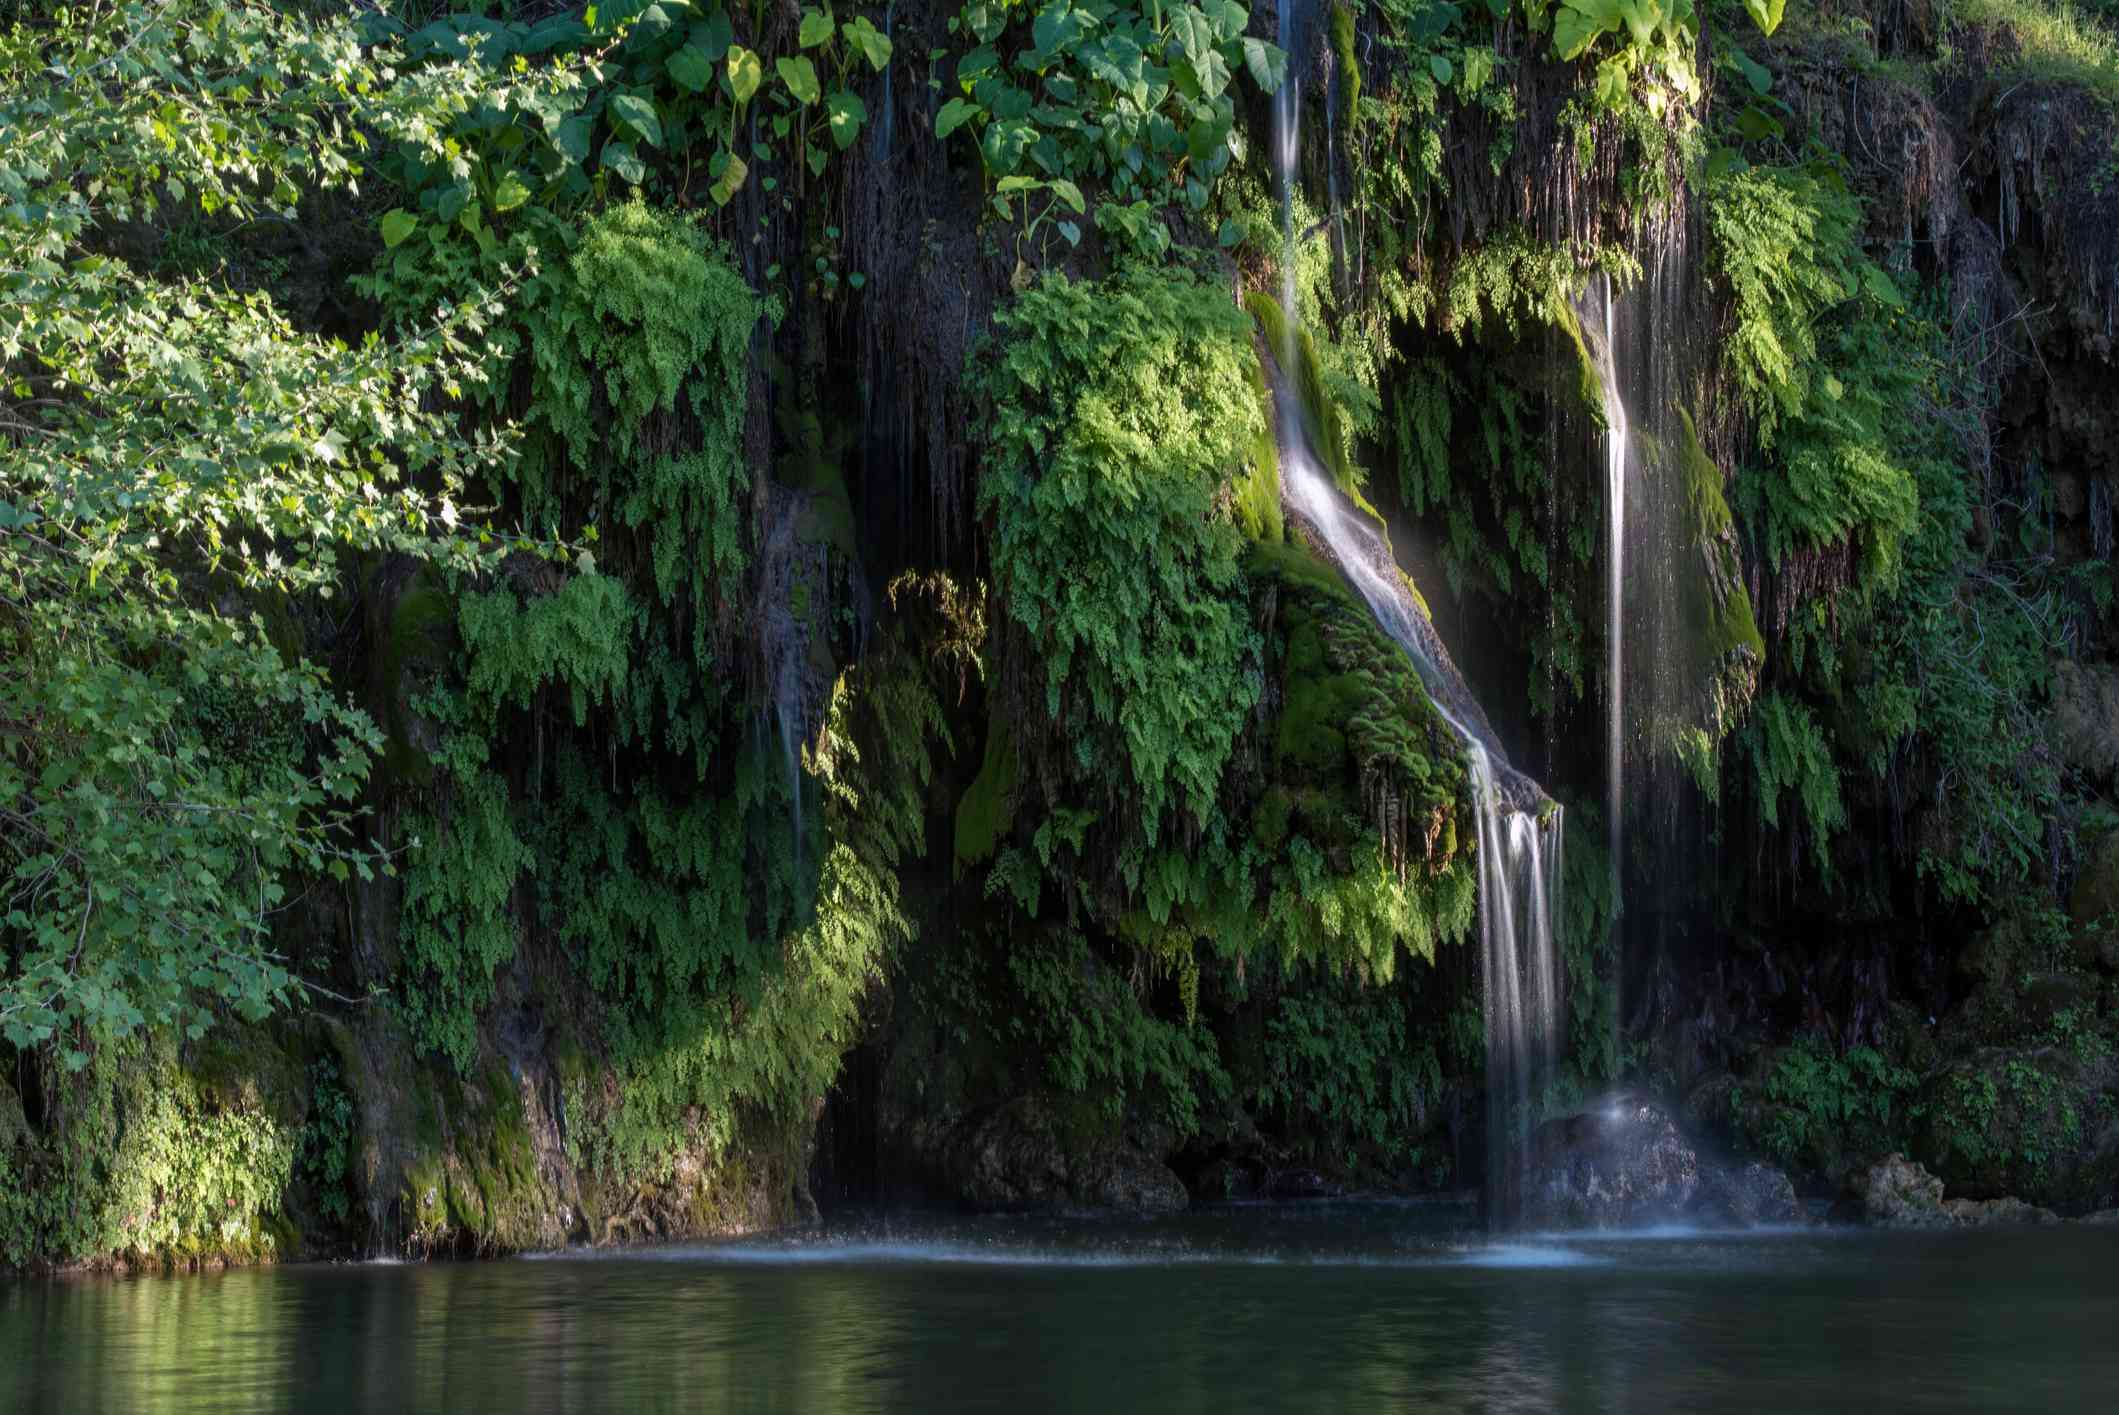 Krause Springs, Spicewood, Texas, USA